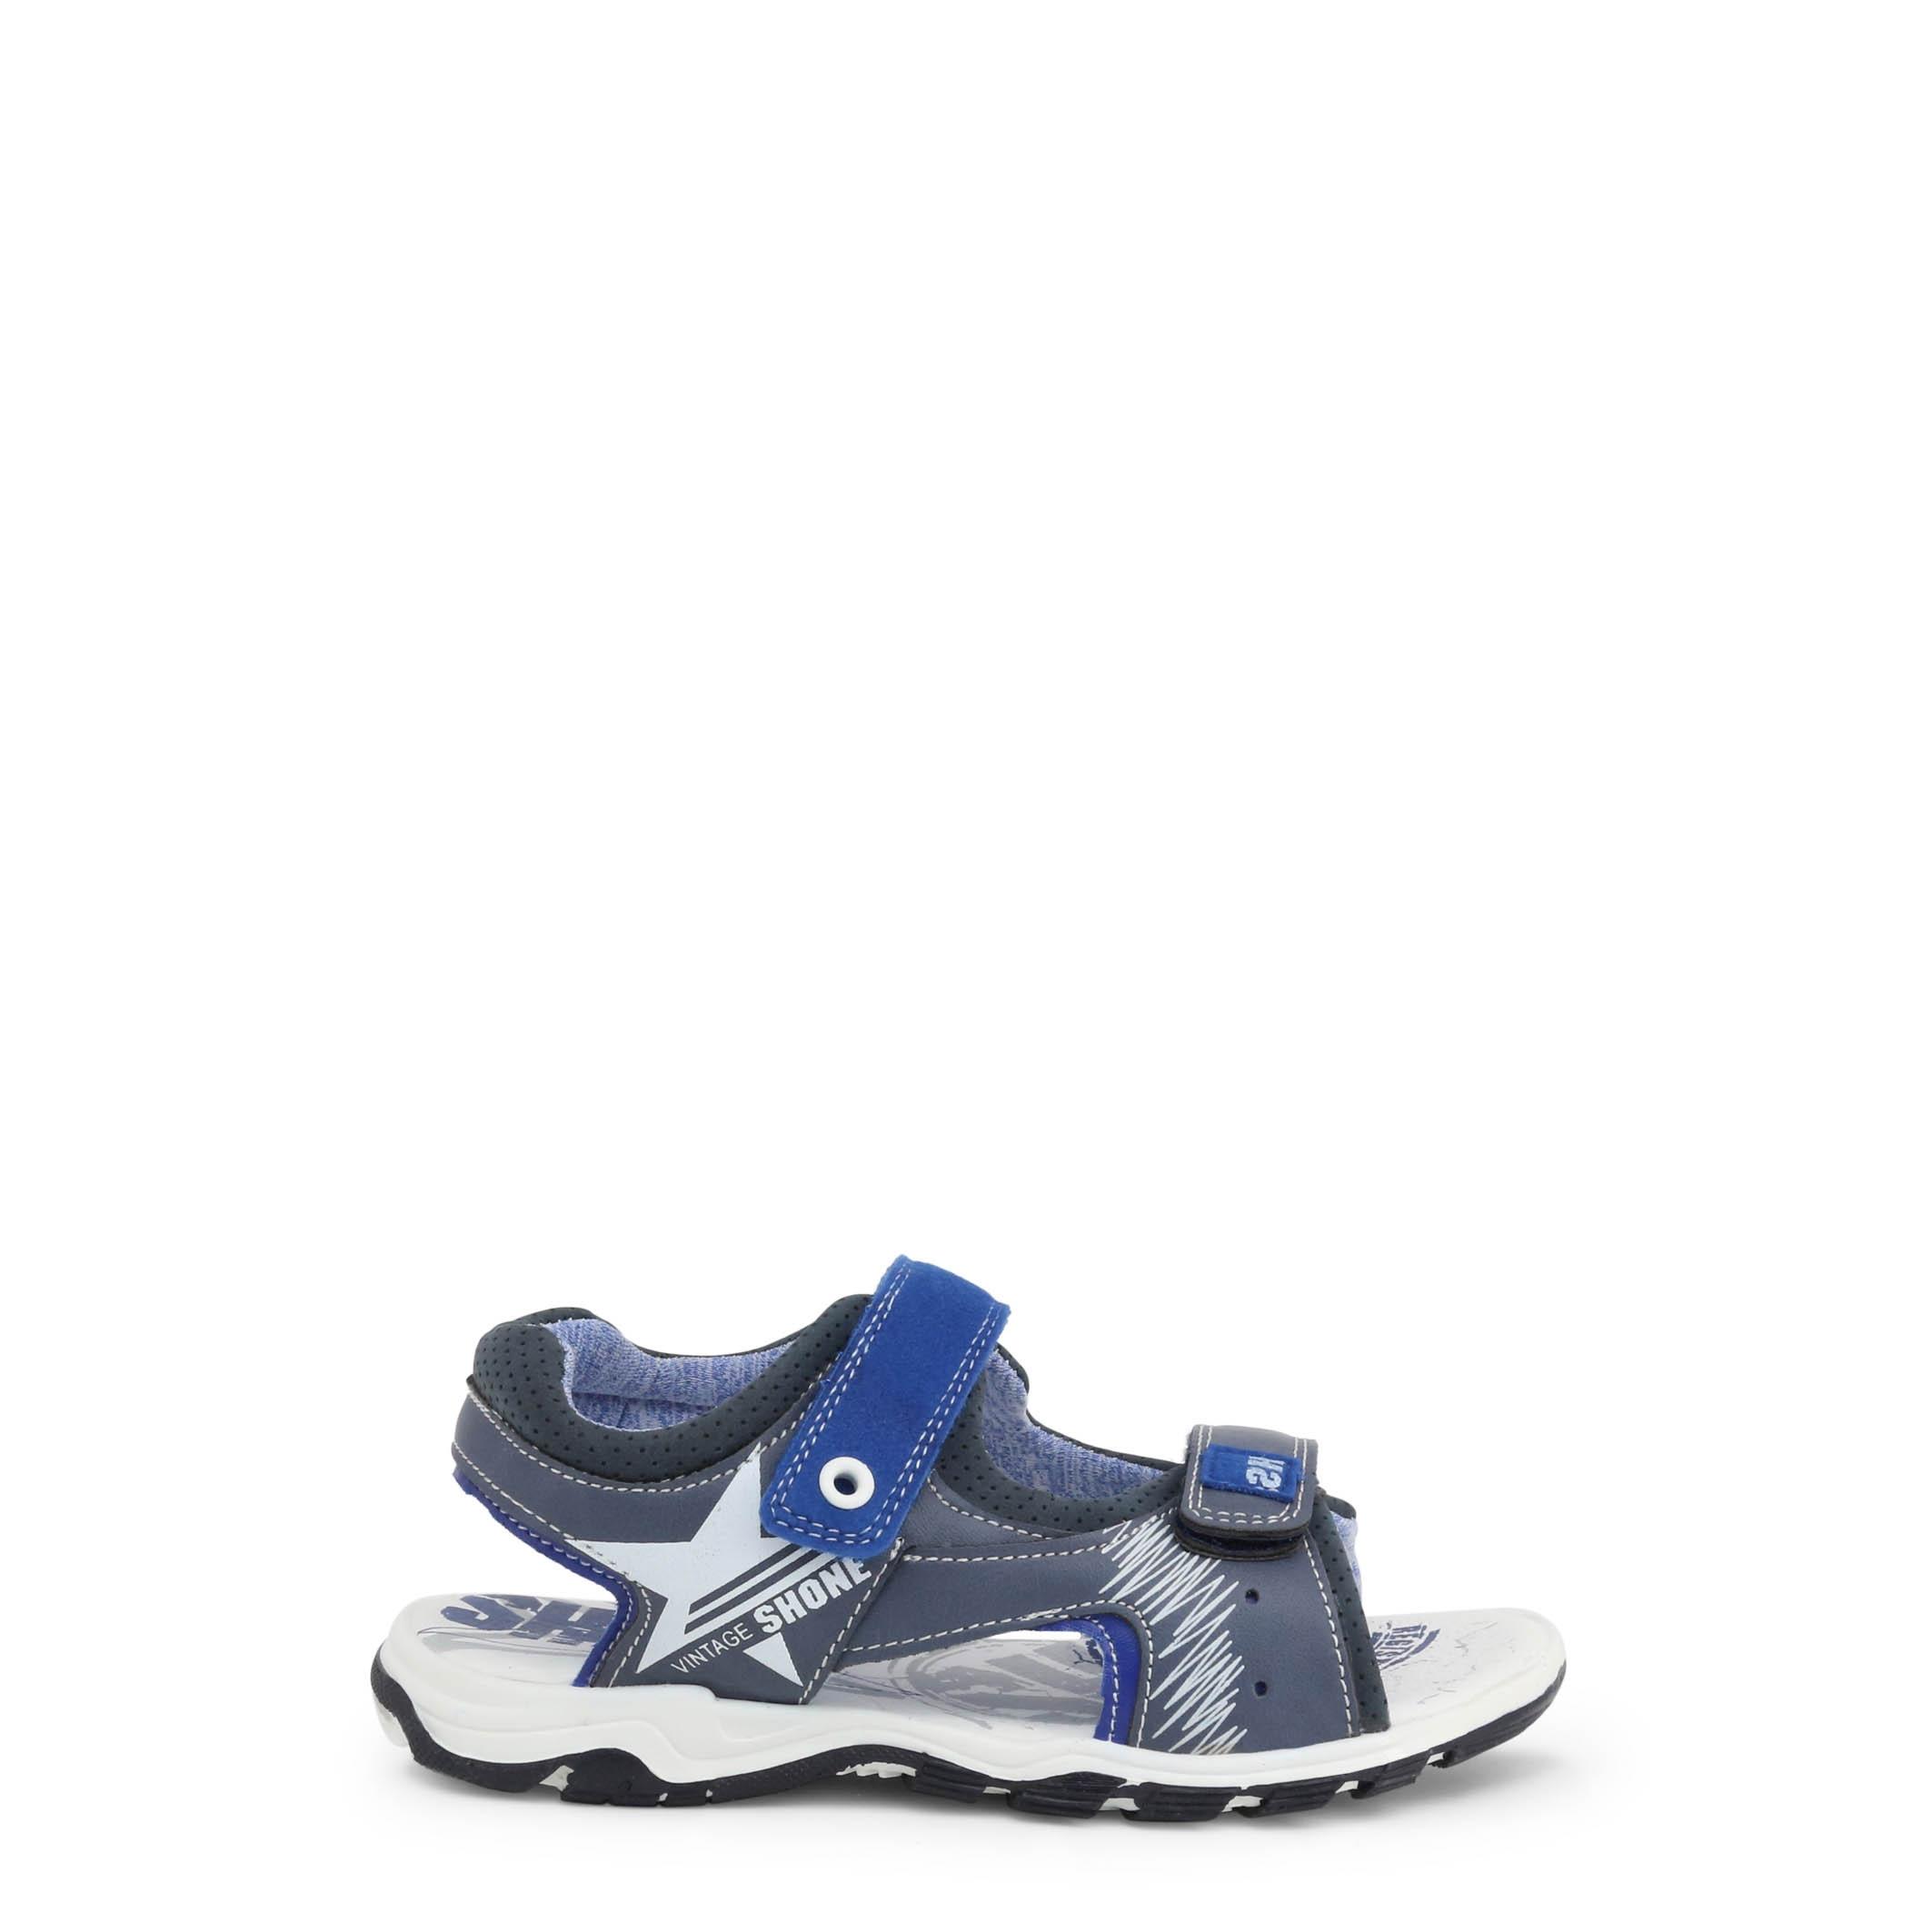 Sandale Shone 6015-027 Albastru